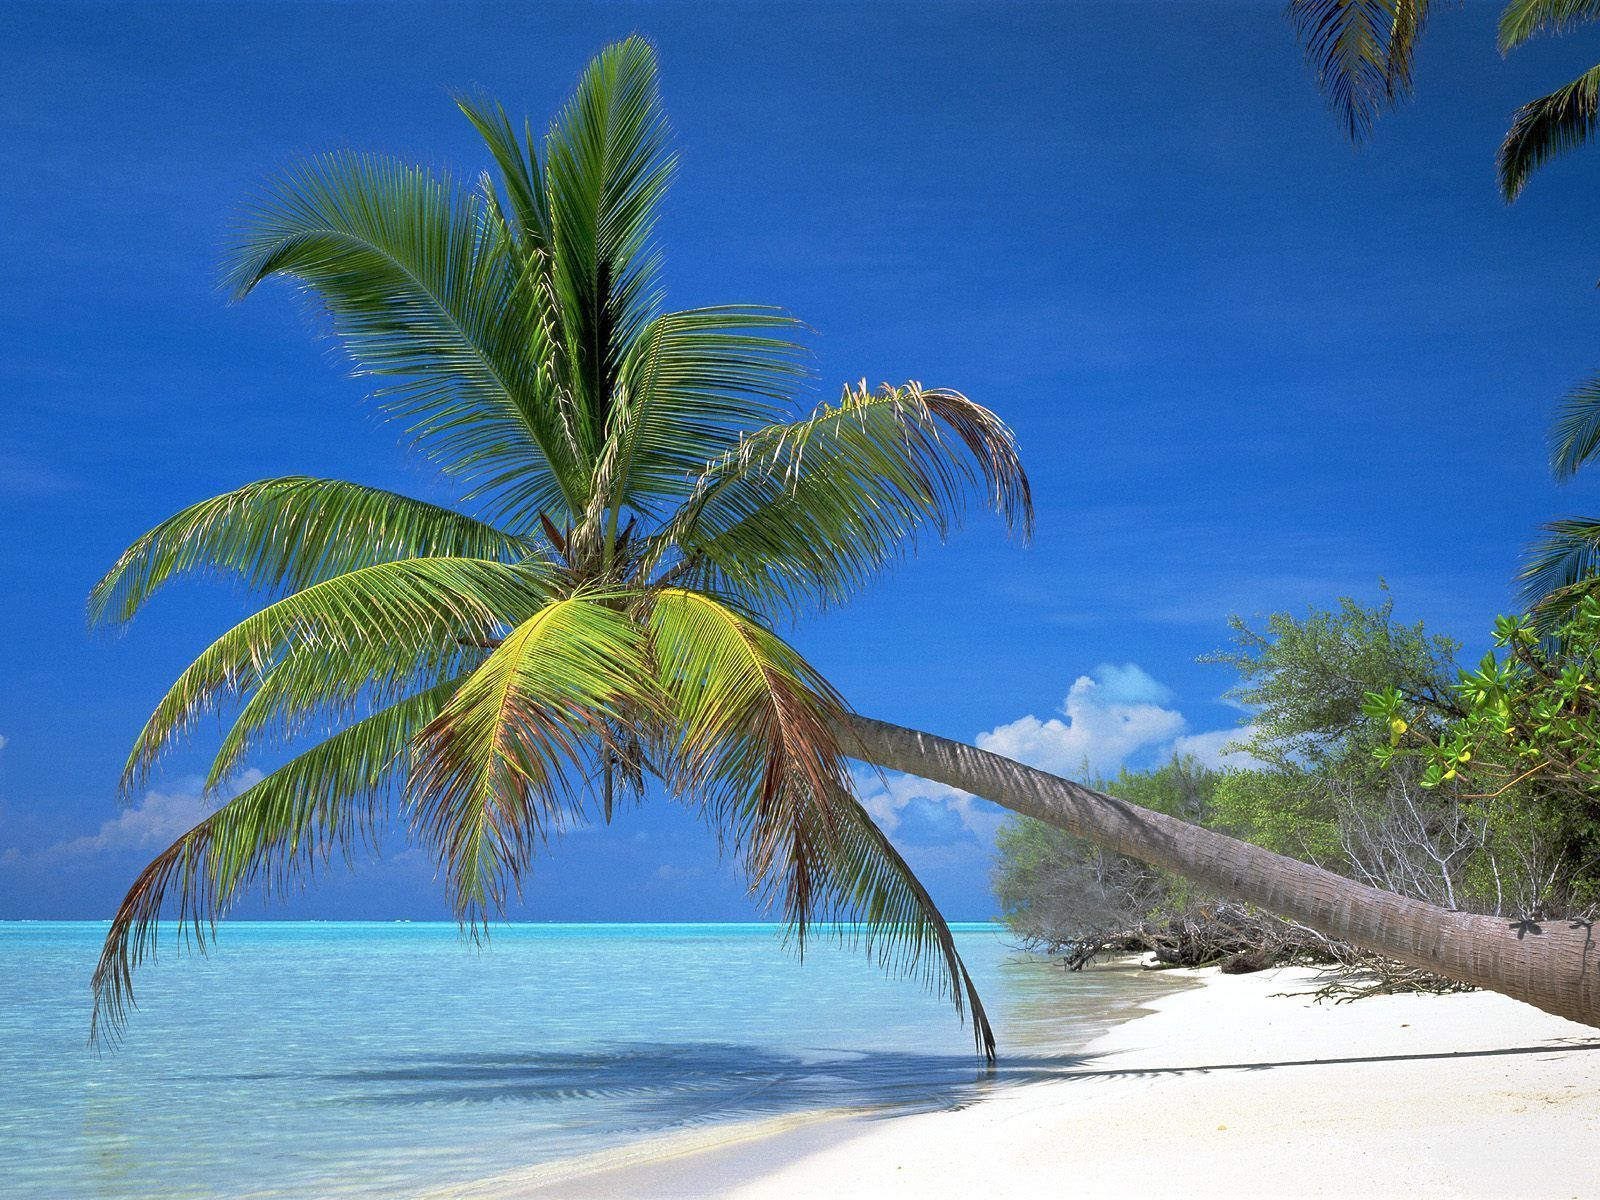 Gratis Vuxen Dating Amerikansk Strand Florida